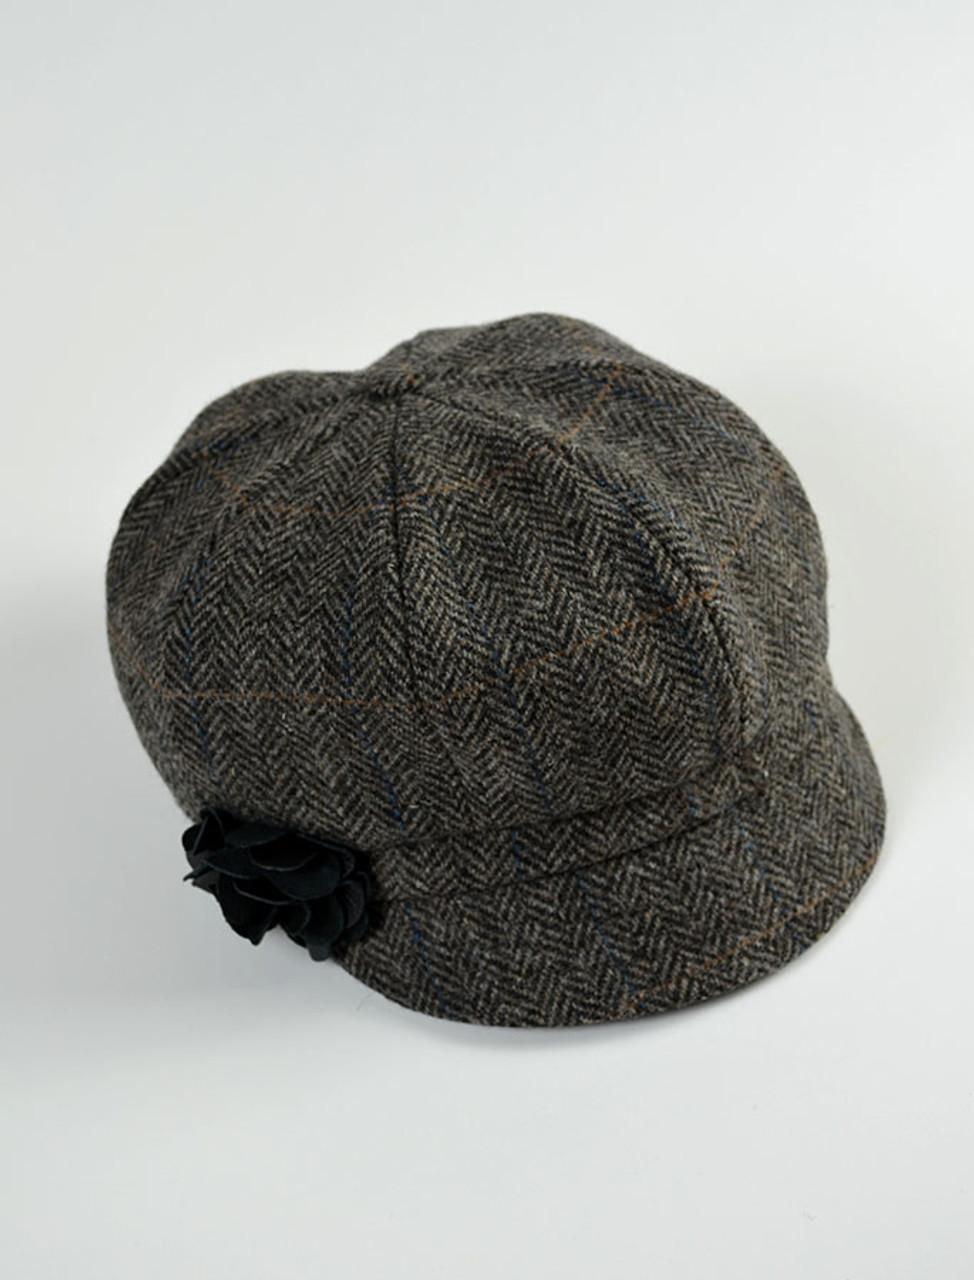 c3e5563375ffcb Ladies Newsboy Hat - Grey with Tan | Aran Sweater Market